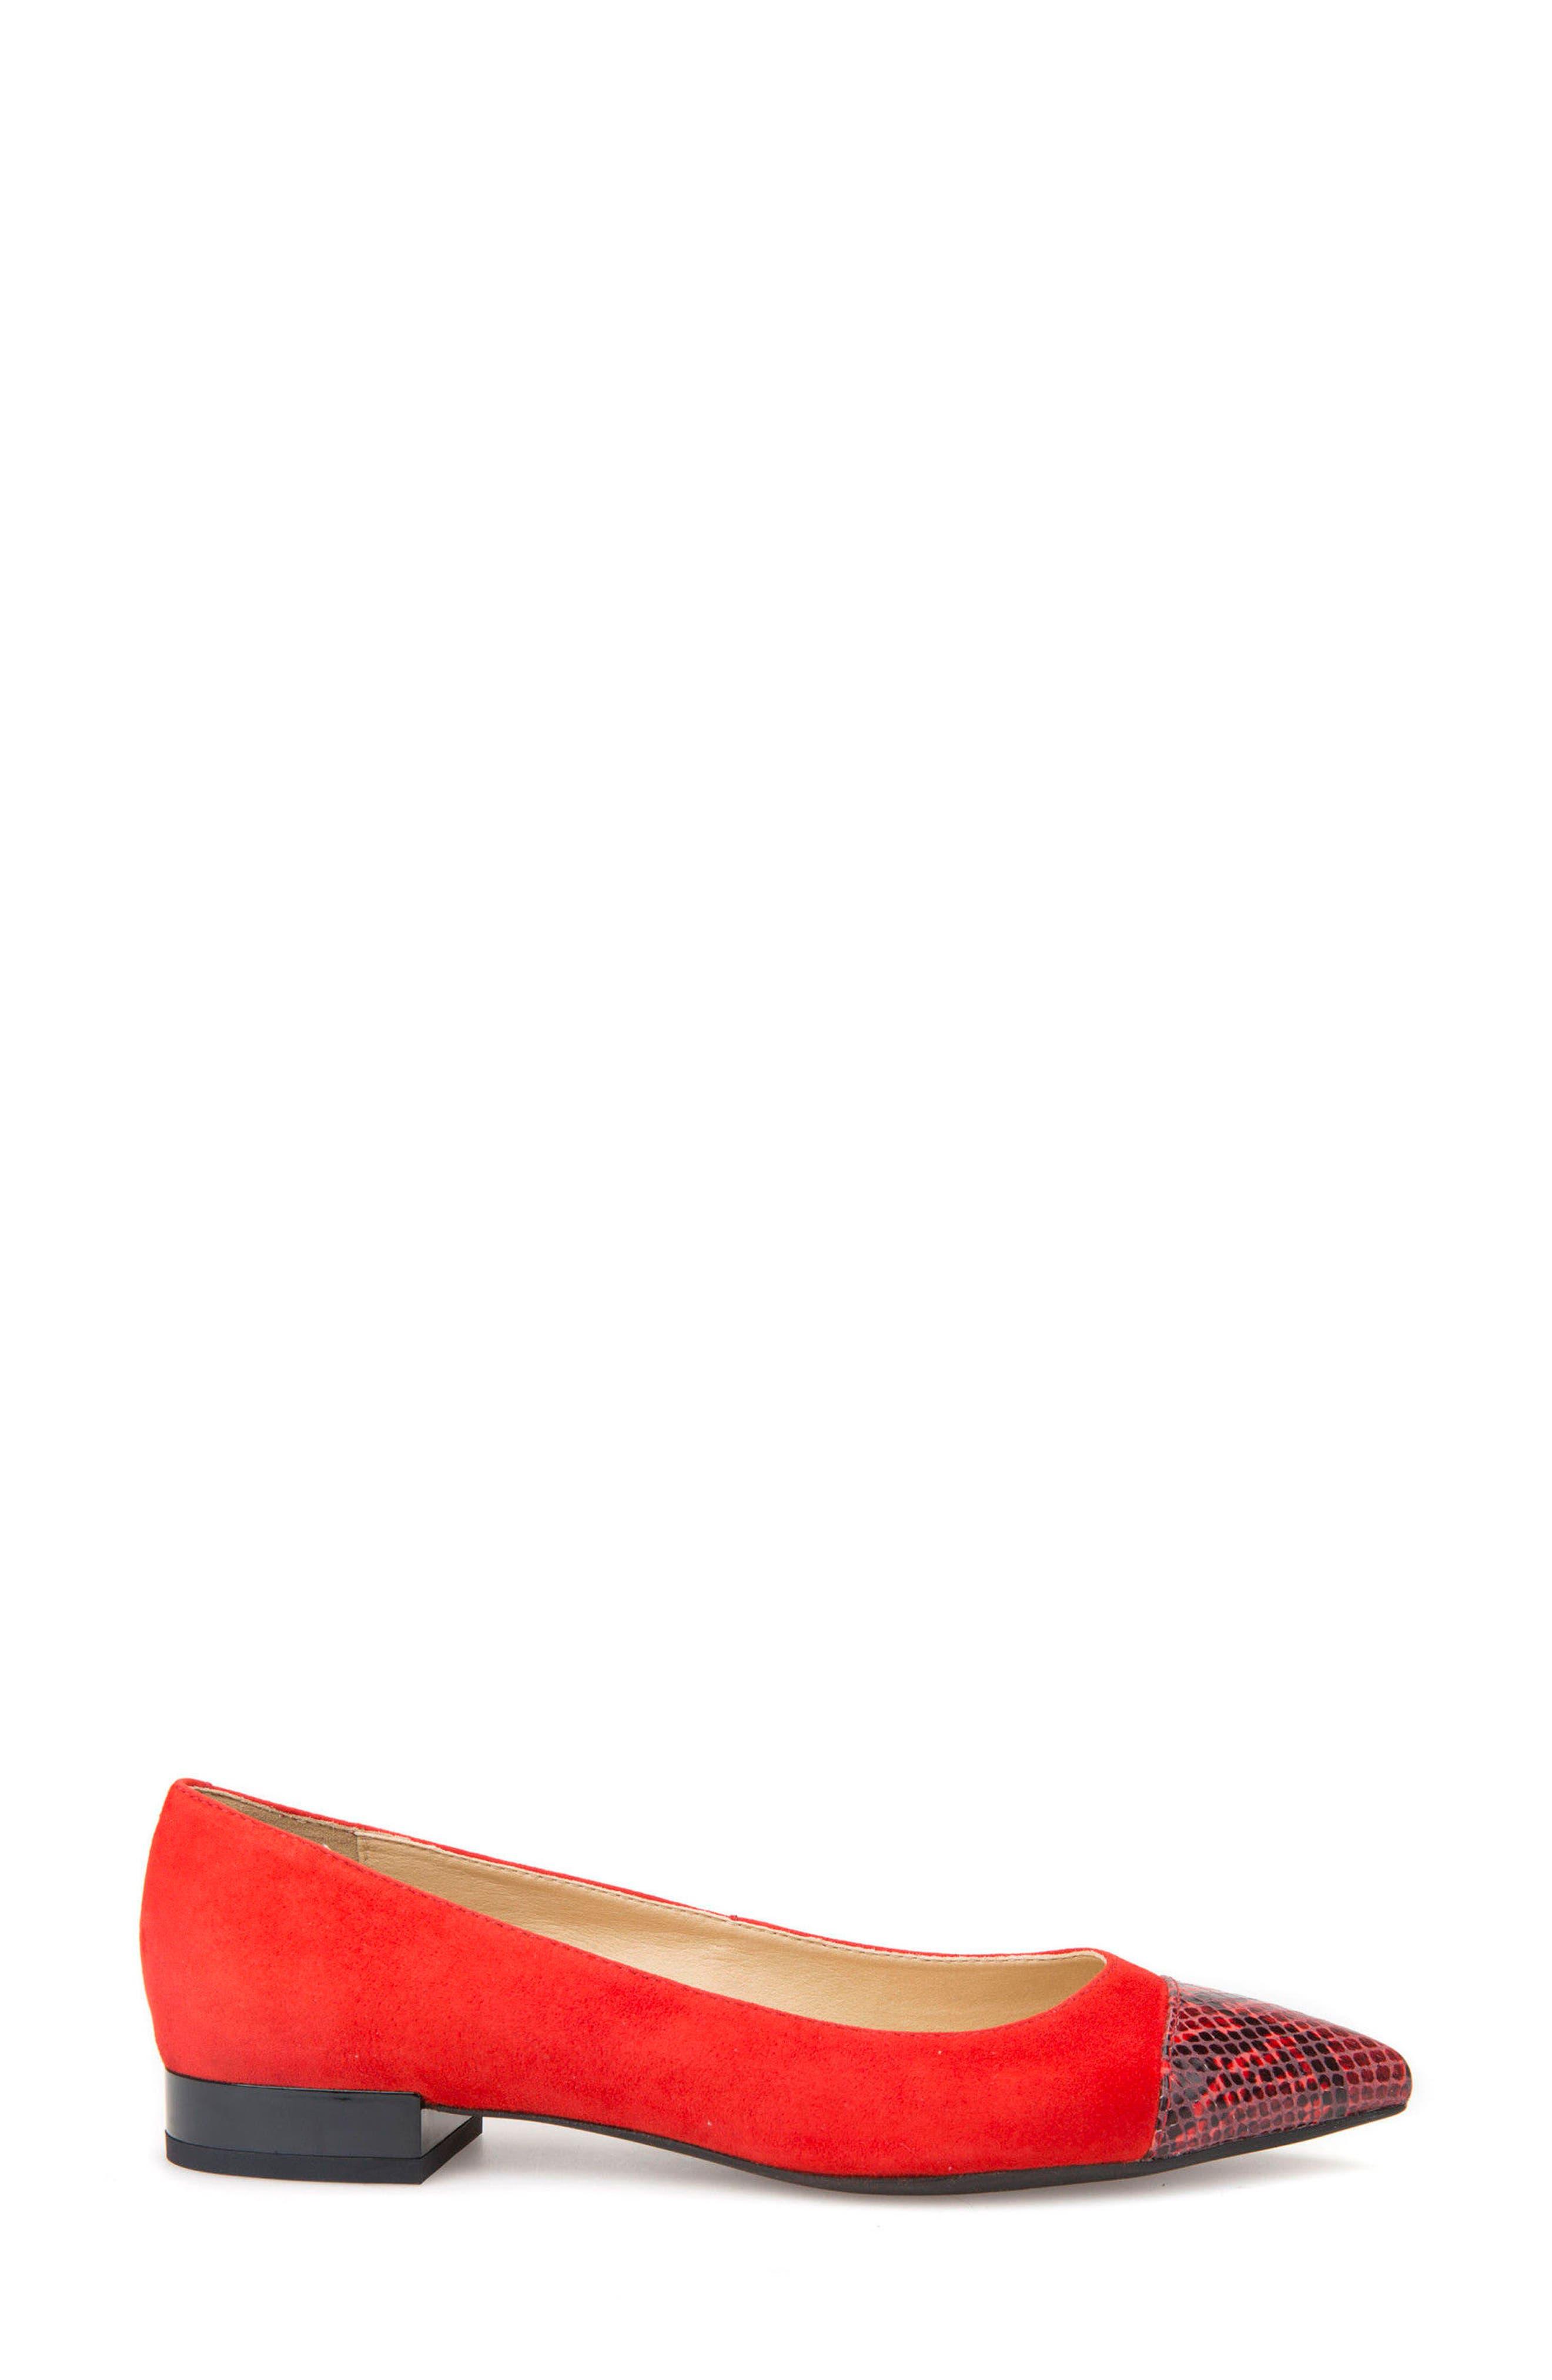 Charyssa Flat,                             Alternate thumbnail 3, color,                             Scarlet Leather